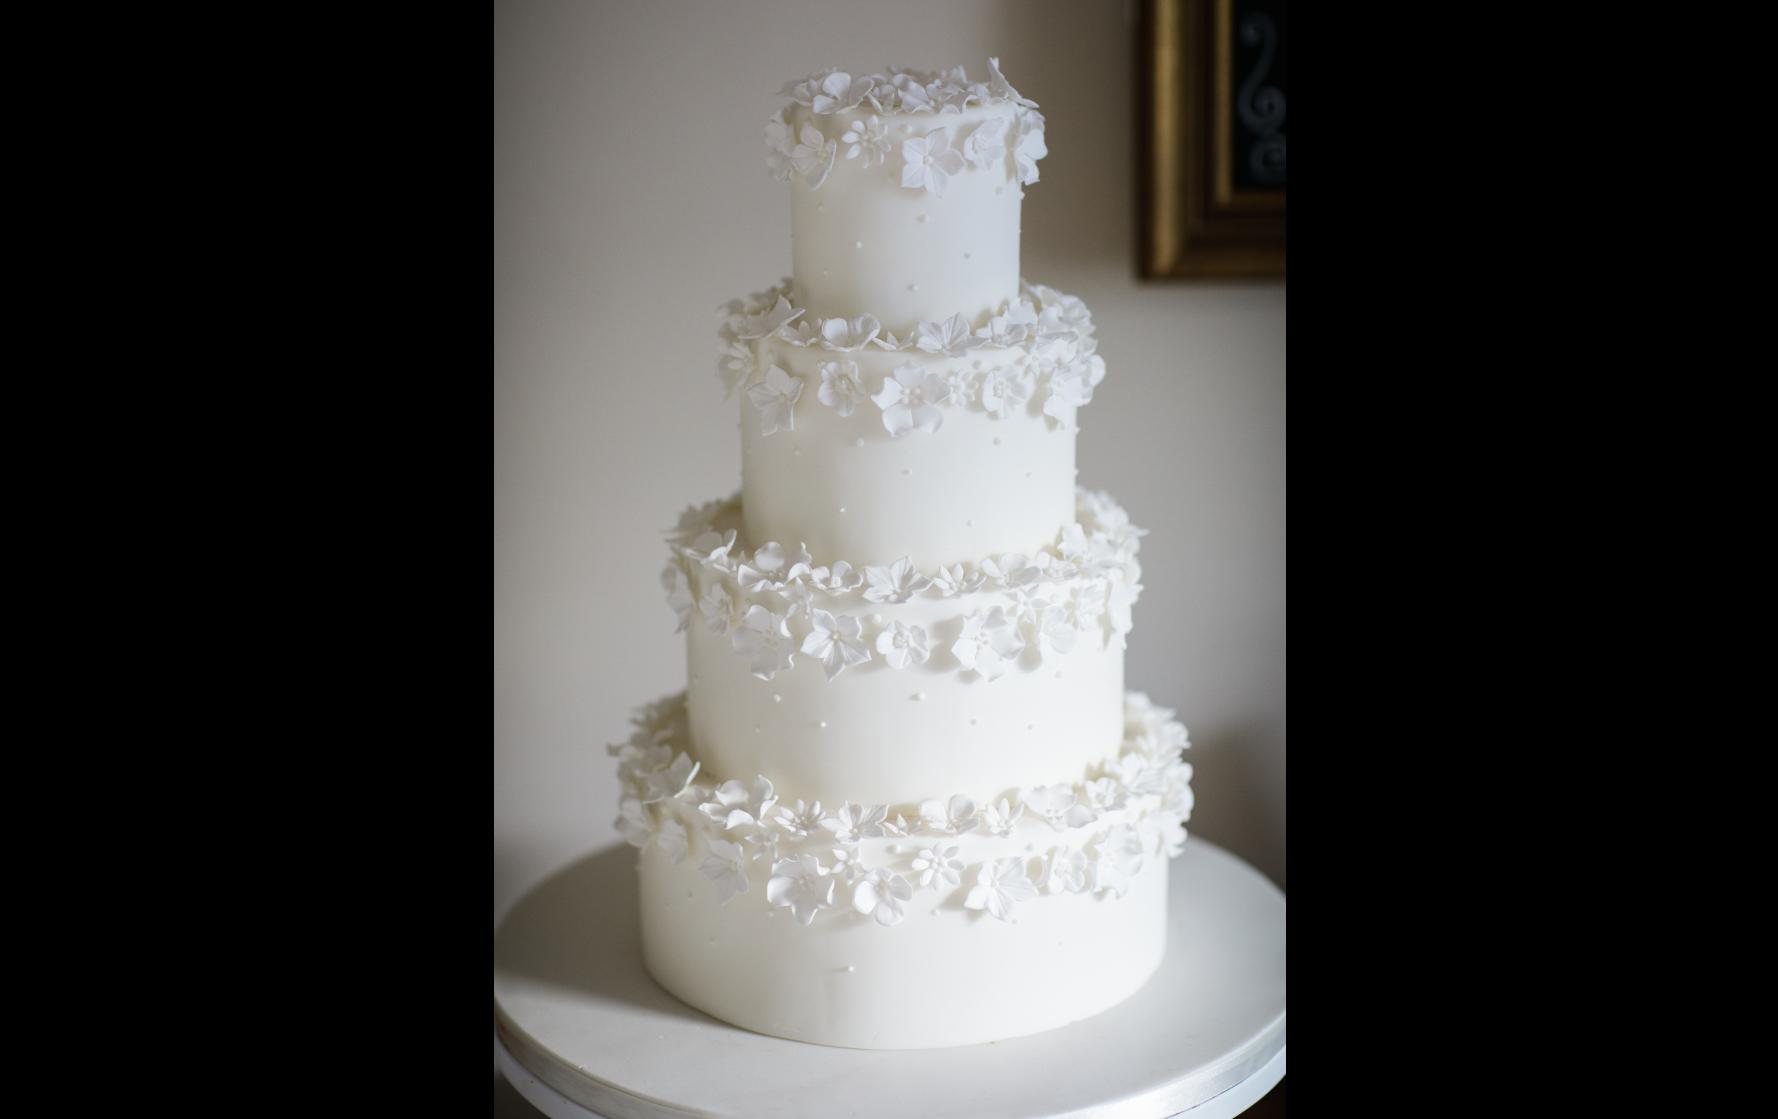 White Sugar Flower Wedding Cake - Pat a Cakes Jersey